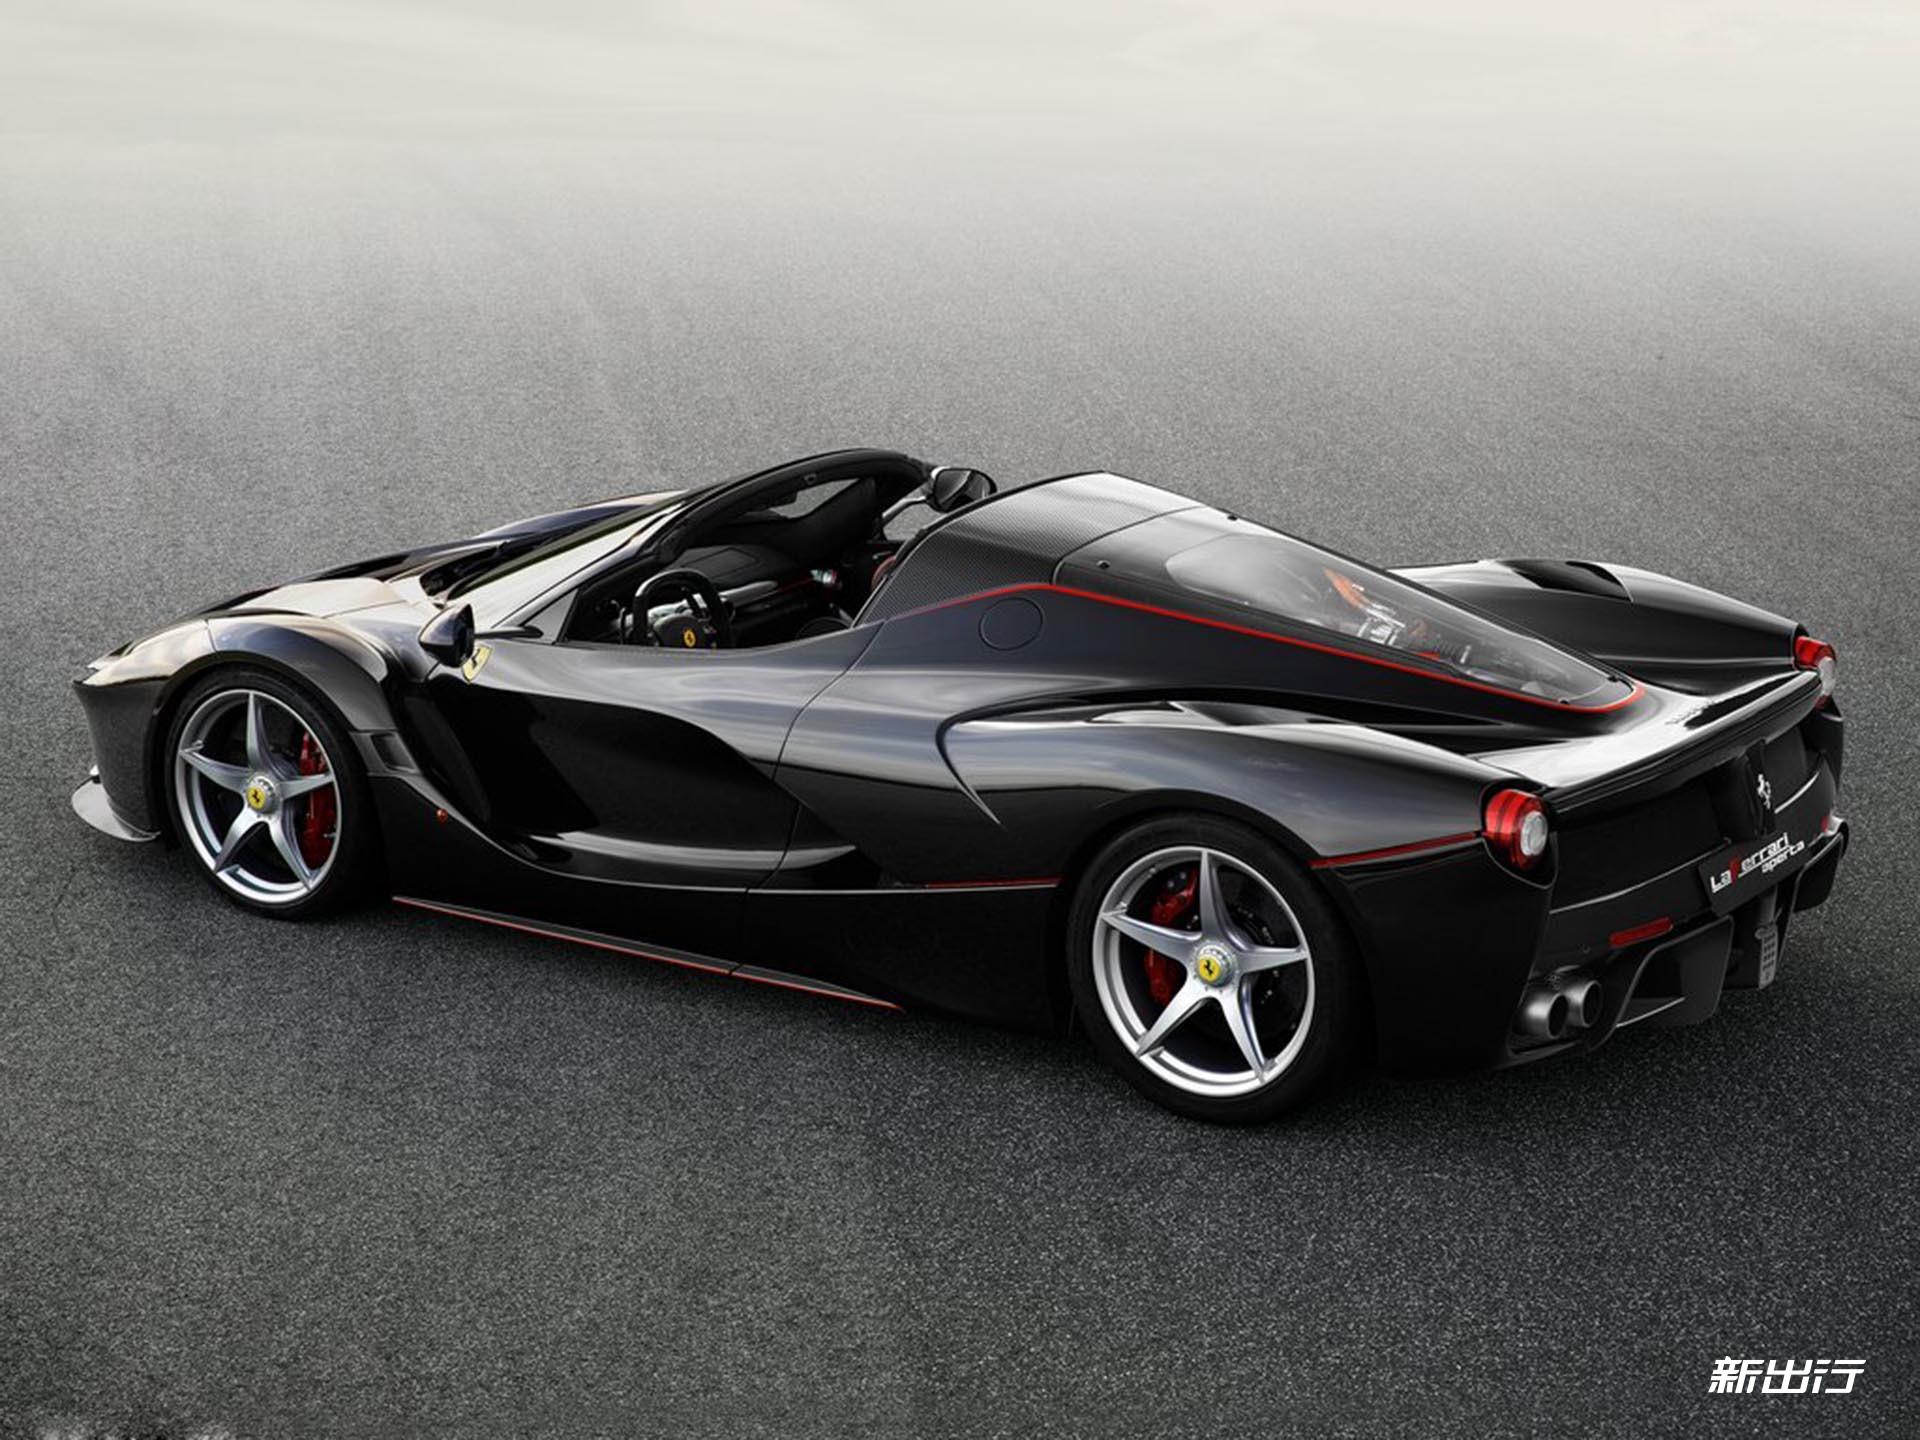 Ferrari-LaFerrari_Aperta-2017-1024-05.jpg